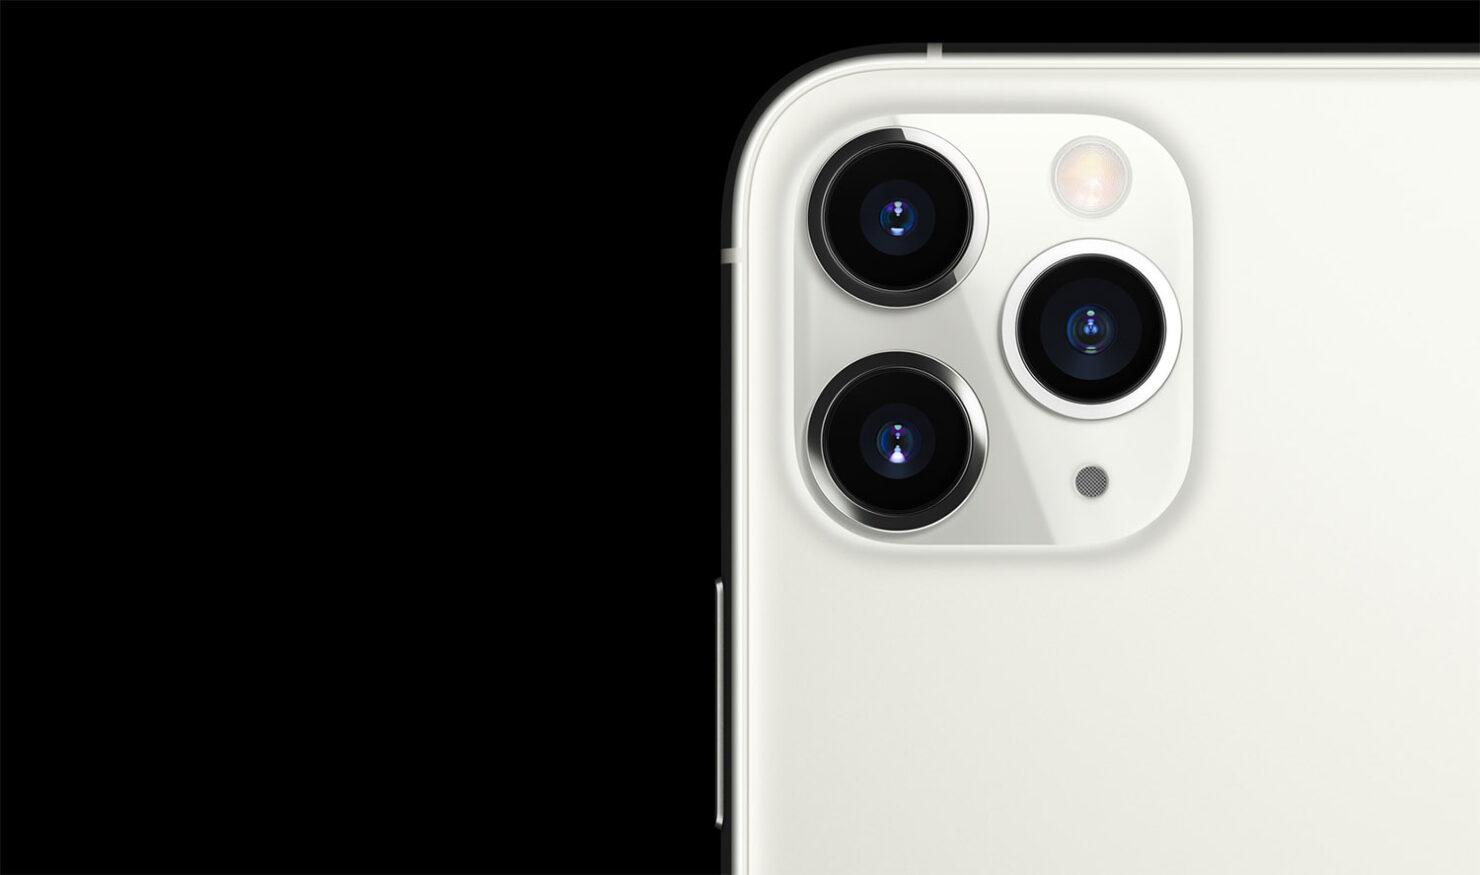 iPhone 12 Price Won't Be High Despite Premium Metal Frame, 5G [Report]